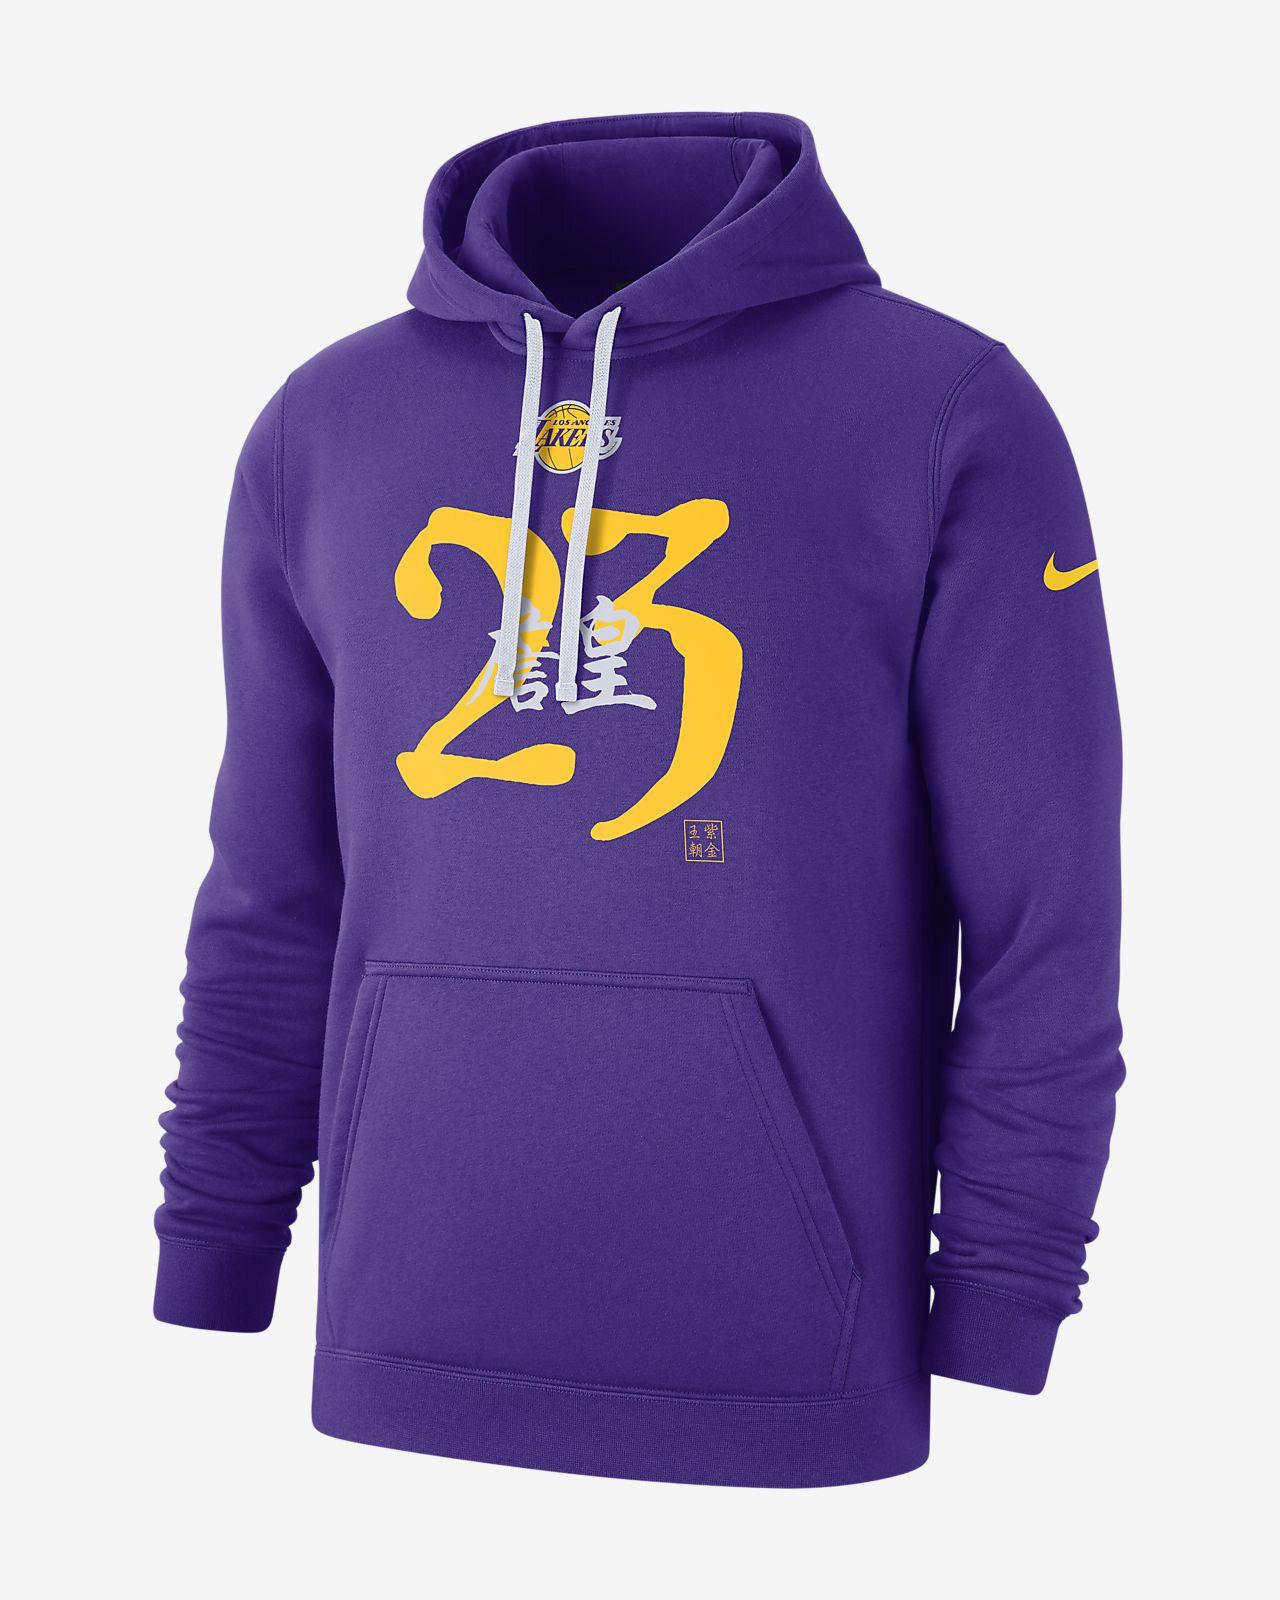 洛杉矶湖人队 (LeBron James) Global Game Nike NBA 男子连帽衫